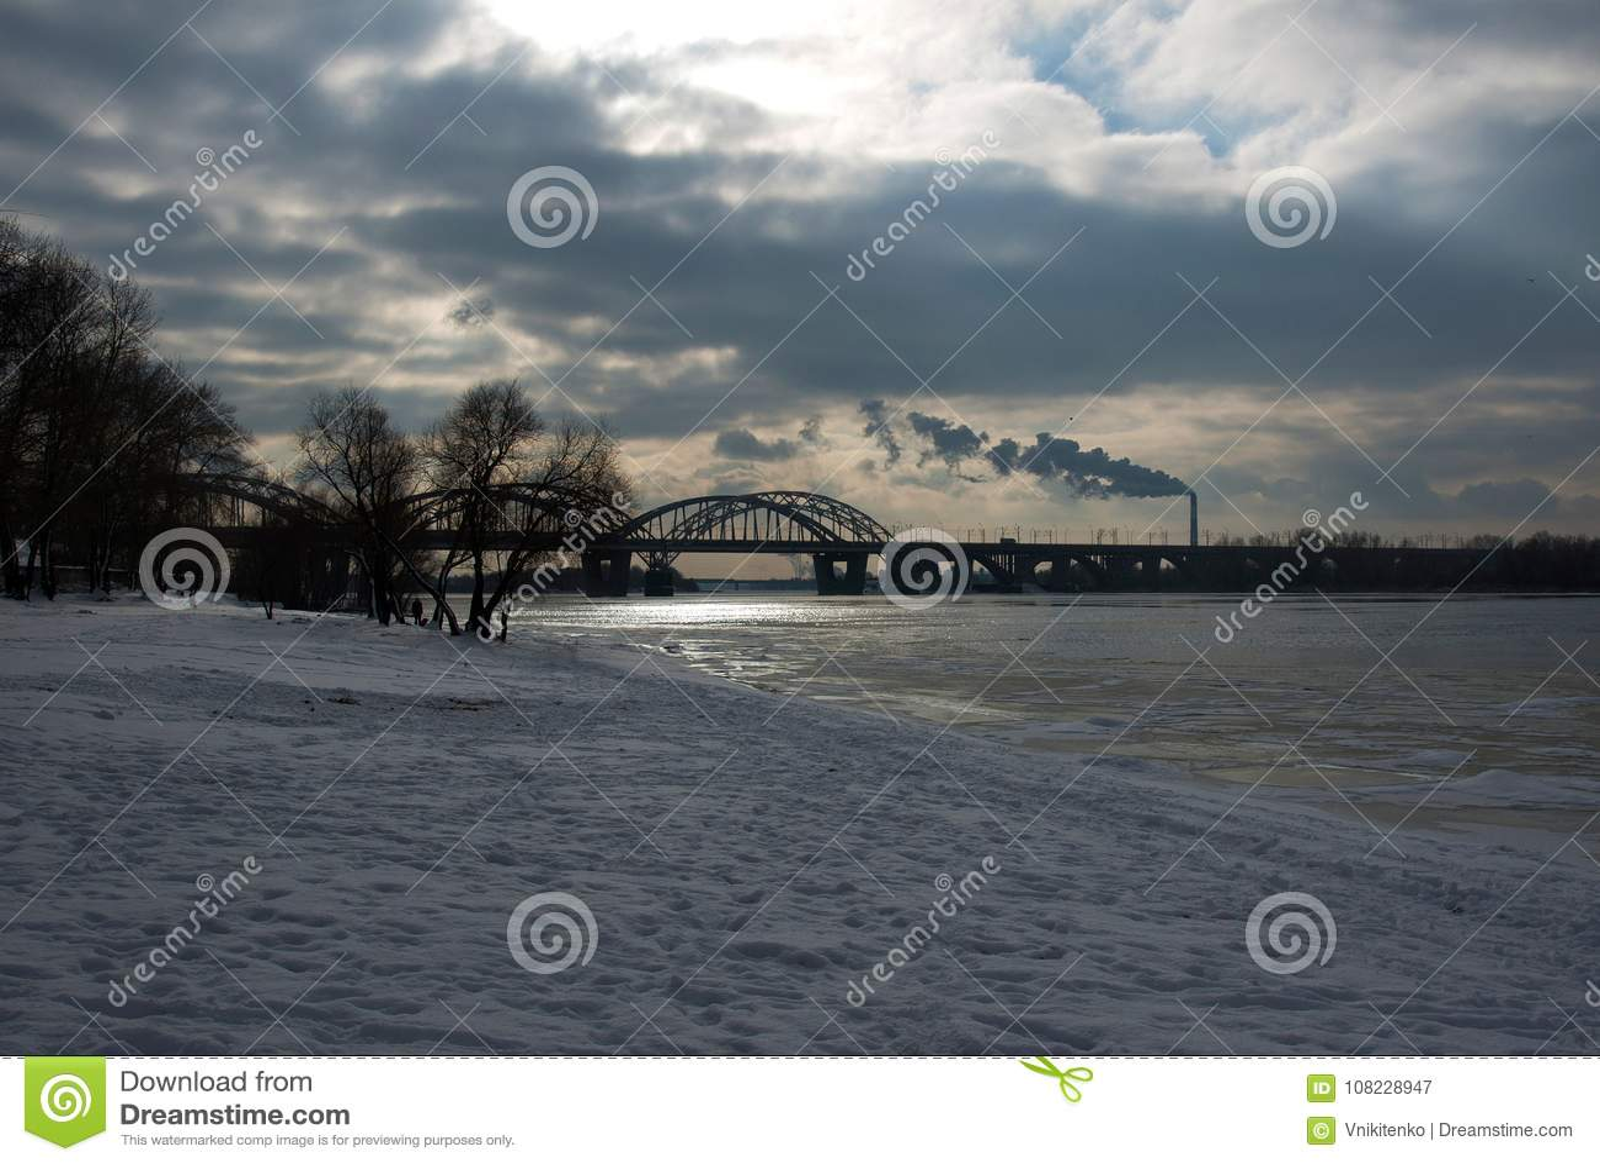 The winter urban evening landscape